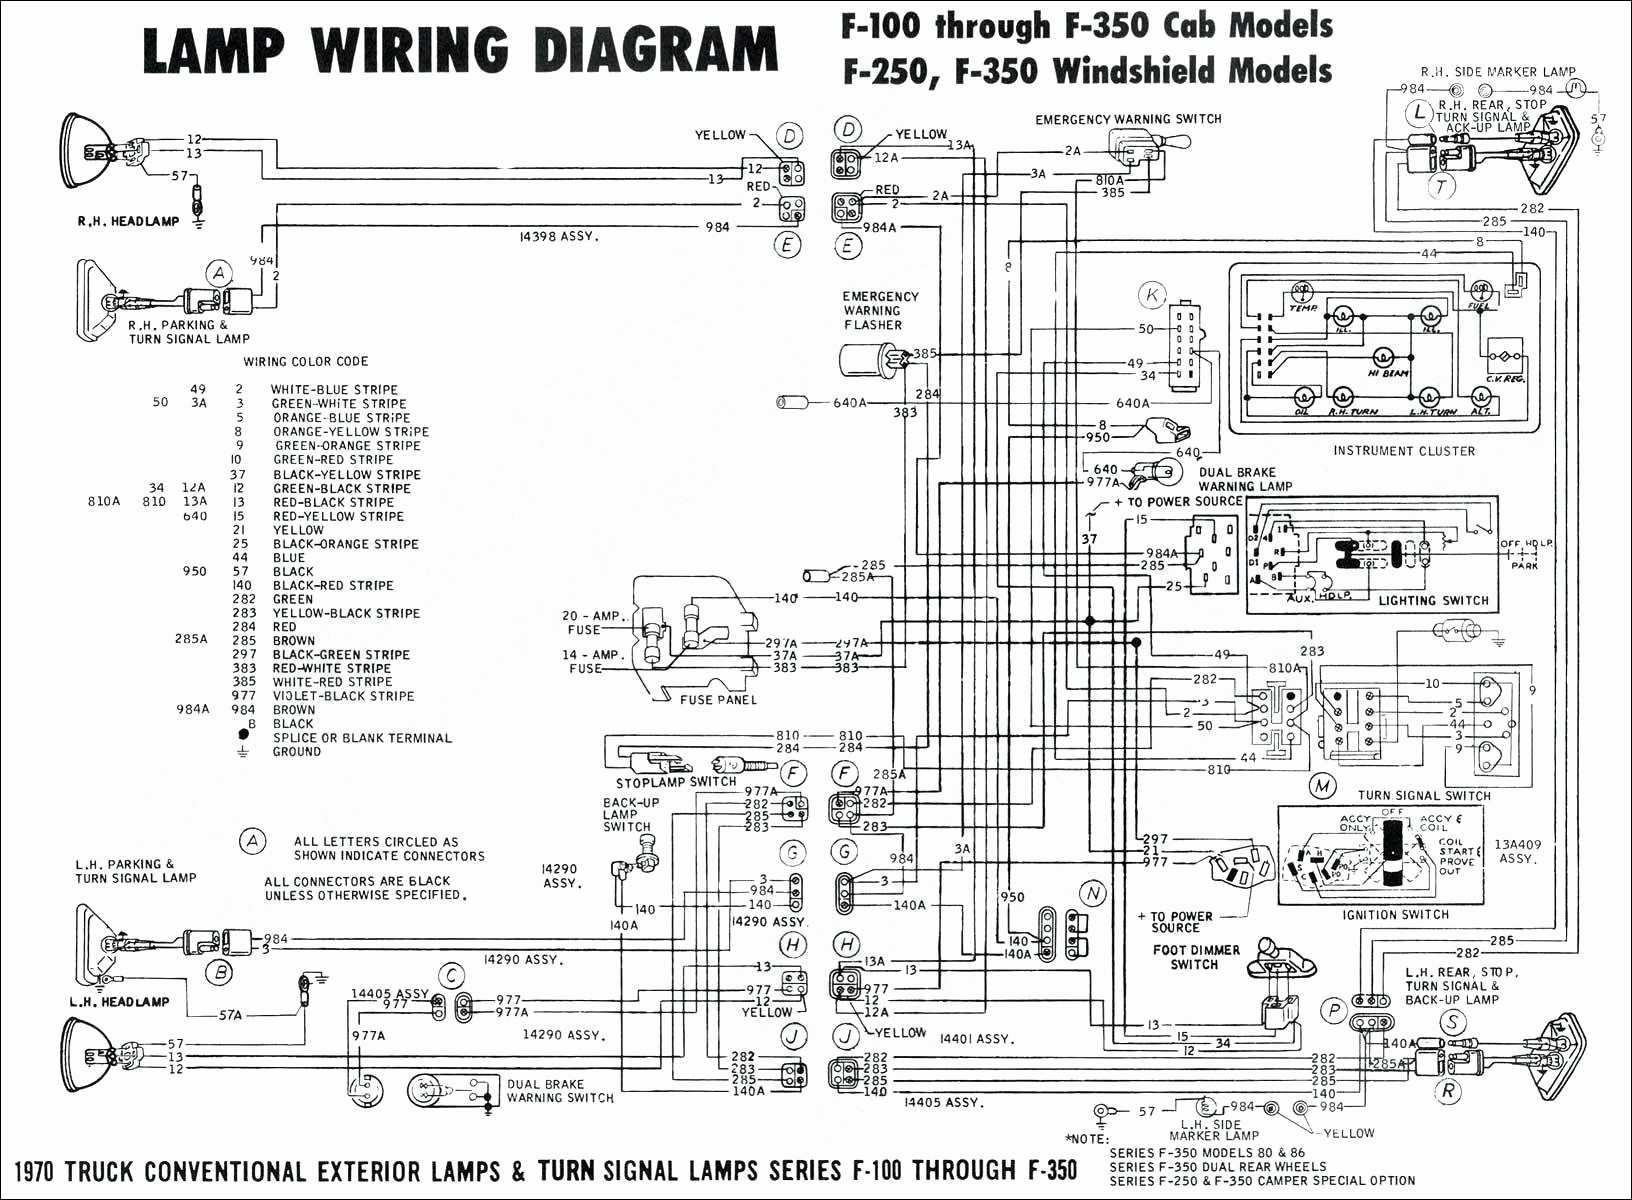 kib enterprises monitor panels manual best of rv monitor panel wiring diagram wiring diagram rules of kib enterprises monitor panels manual